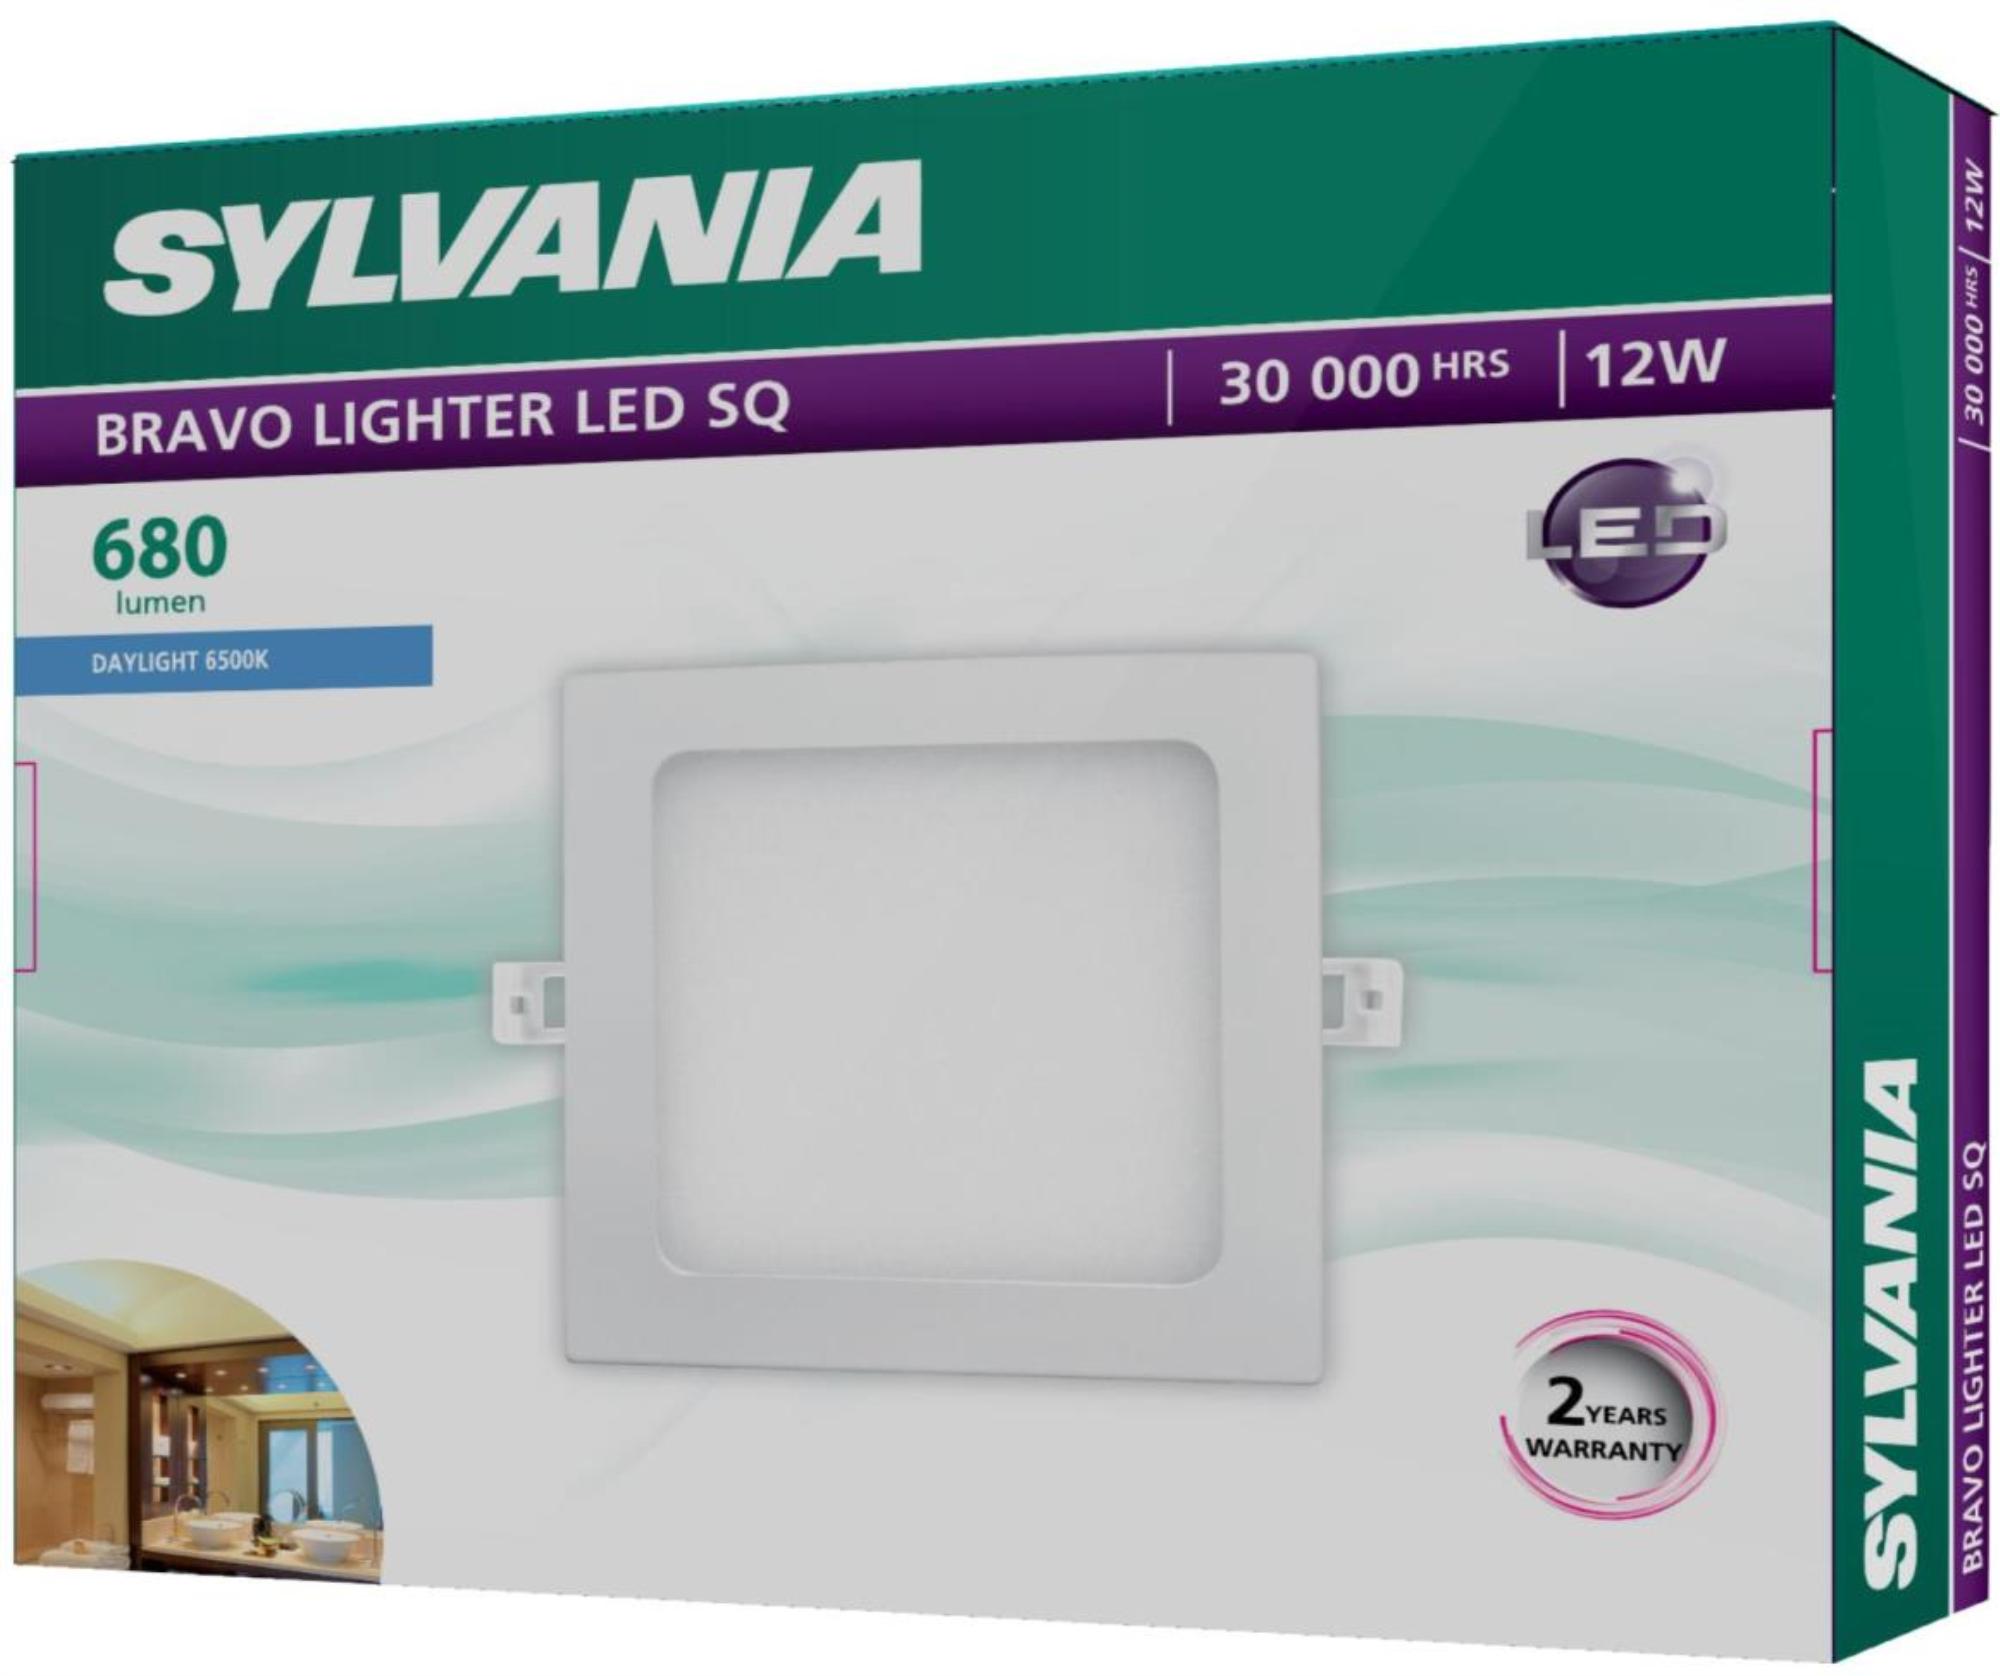 SYLVANIA  ดาวน์ไลท์ BRAVO LIGHTER LED SQ  _12 วัตต์ (แสงเดย์ไลท์)